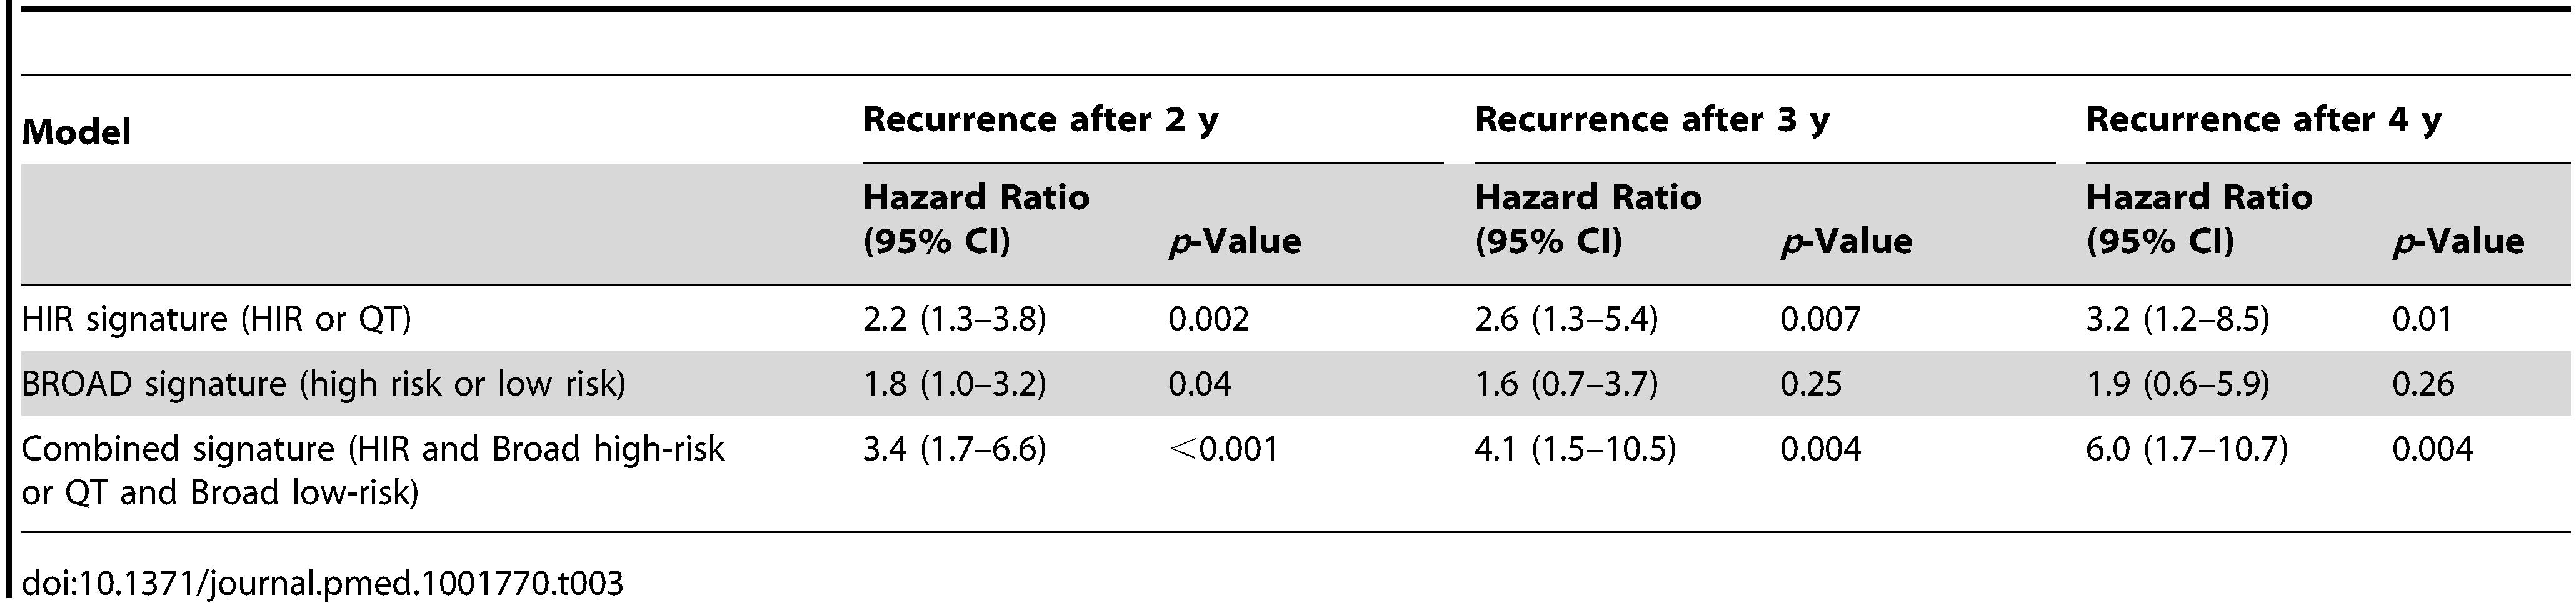 Hazard ratios of high-risk groups in three prognostic models.